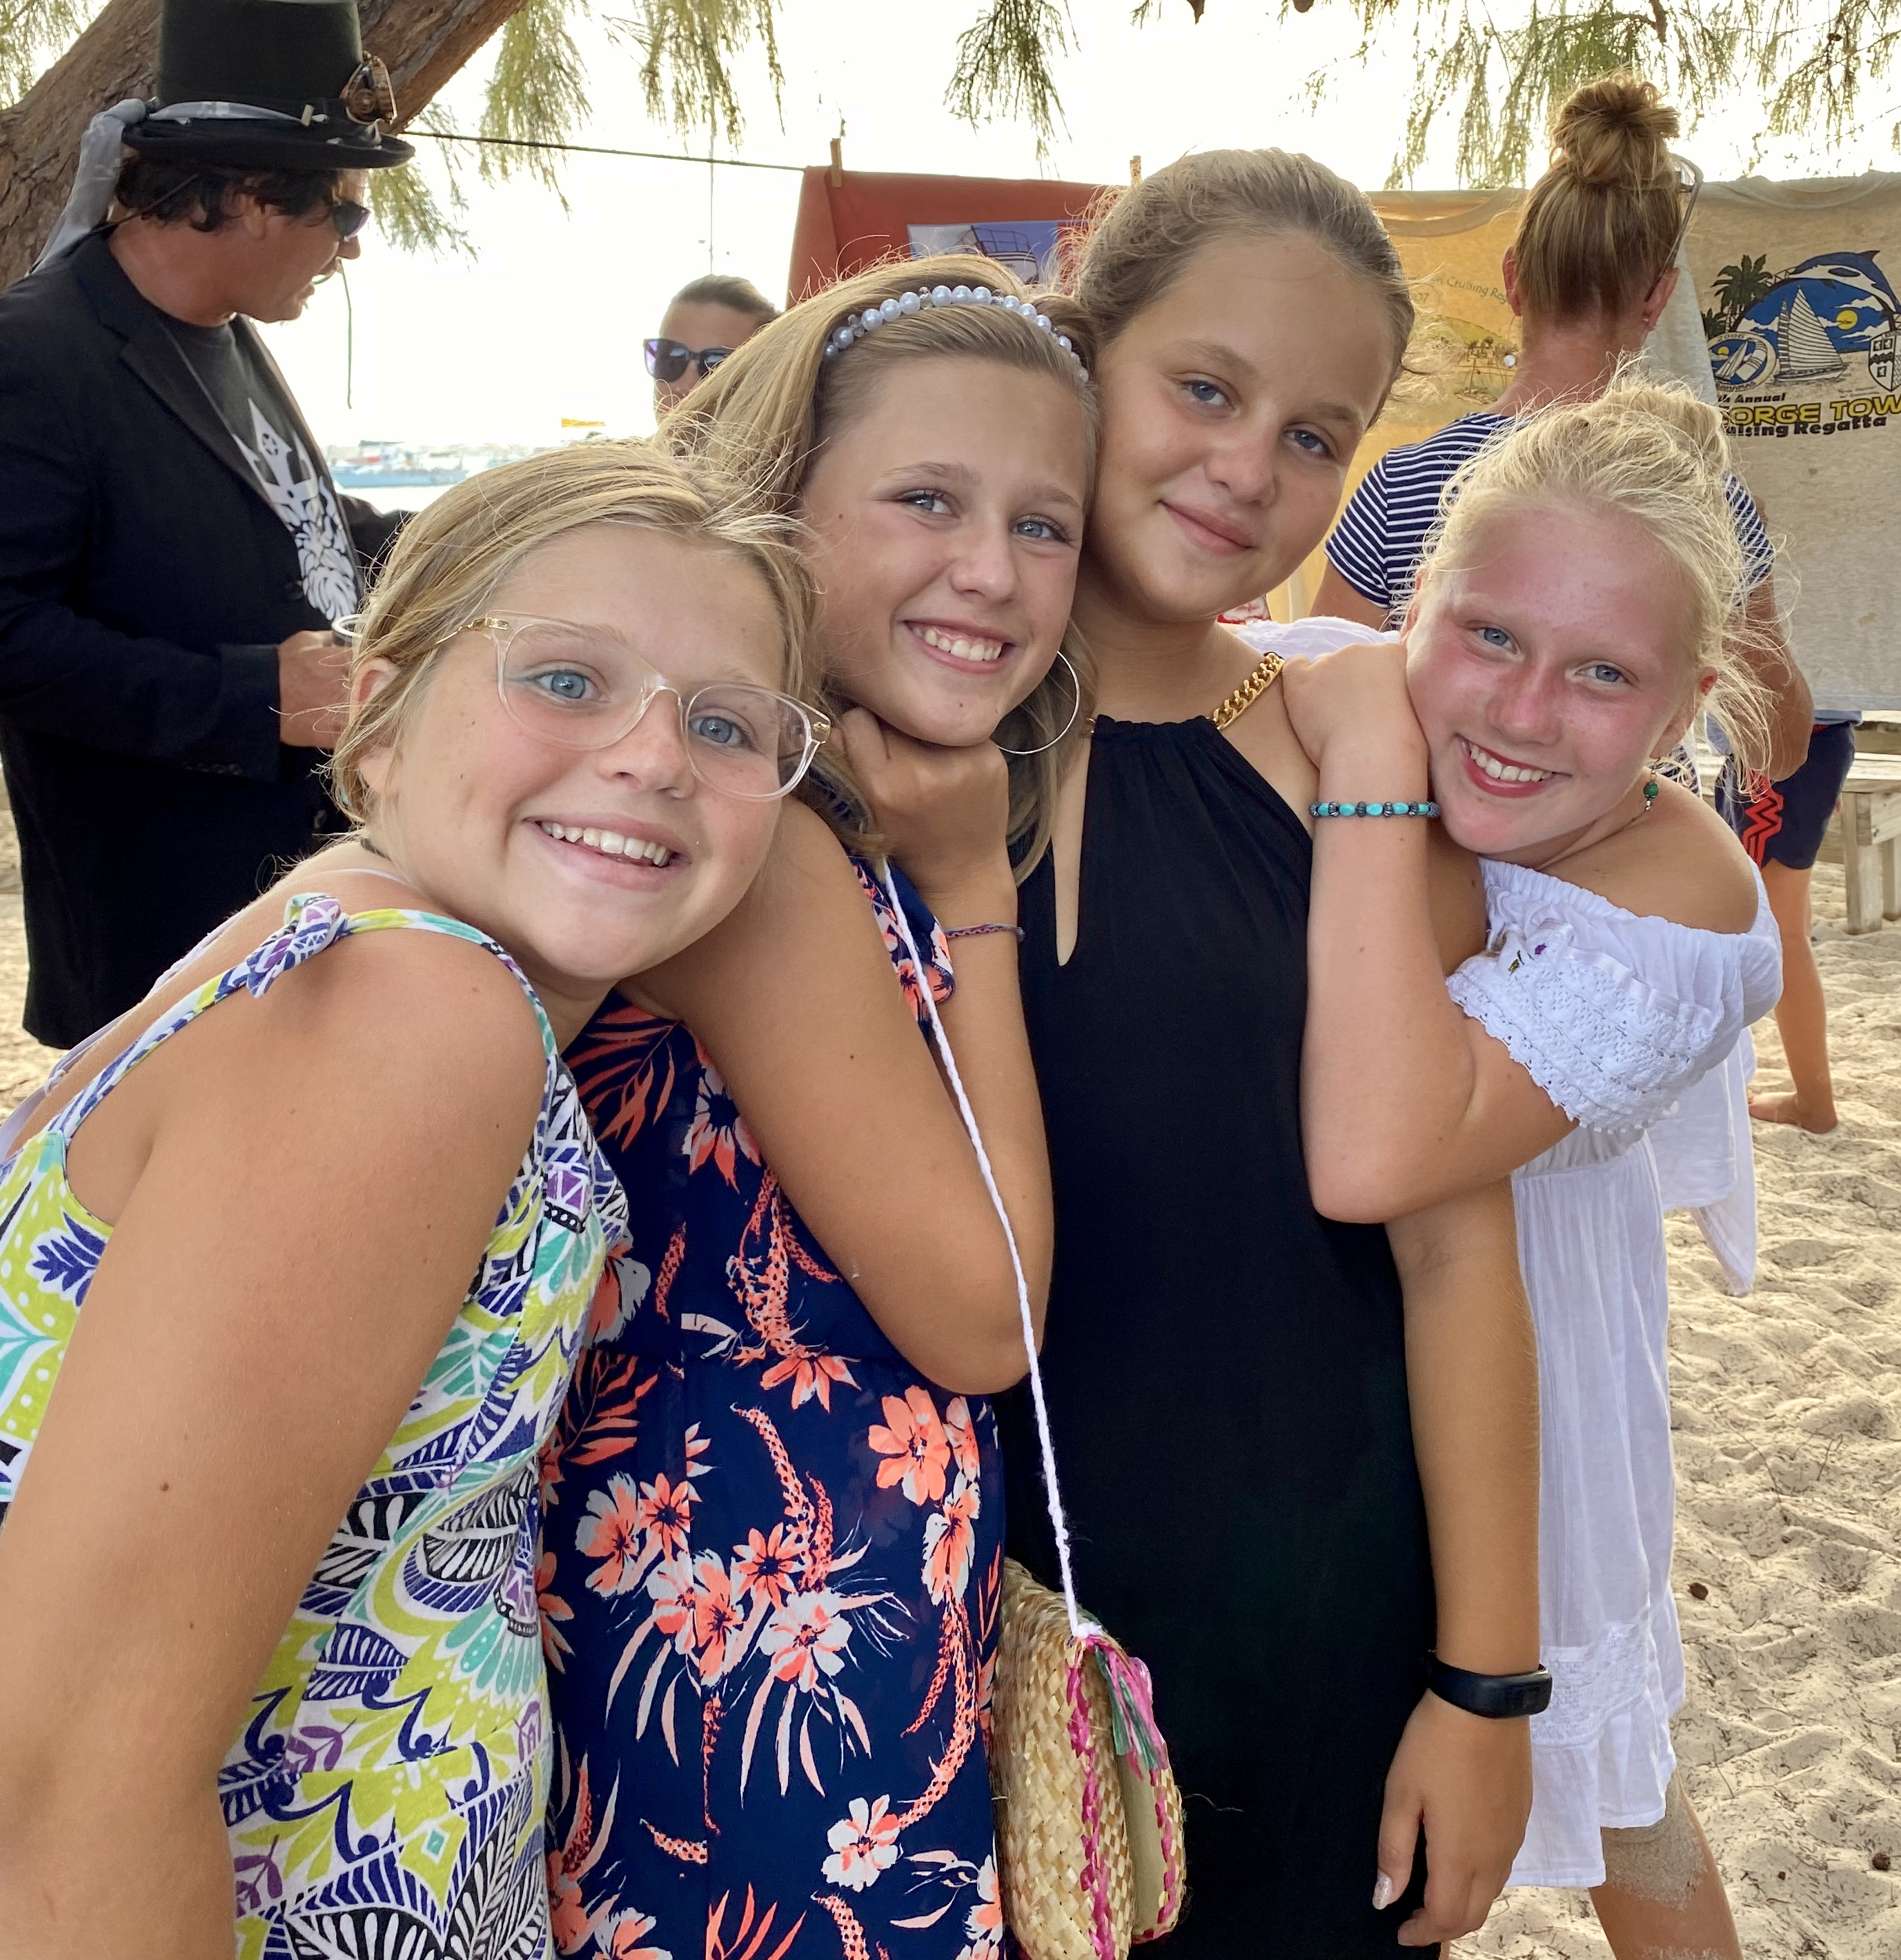 Girls at the Gala